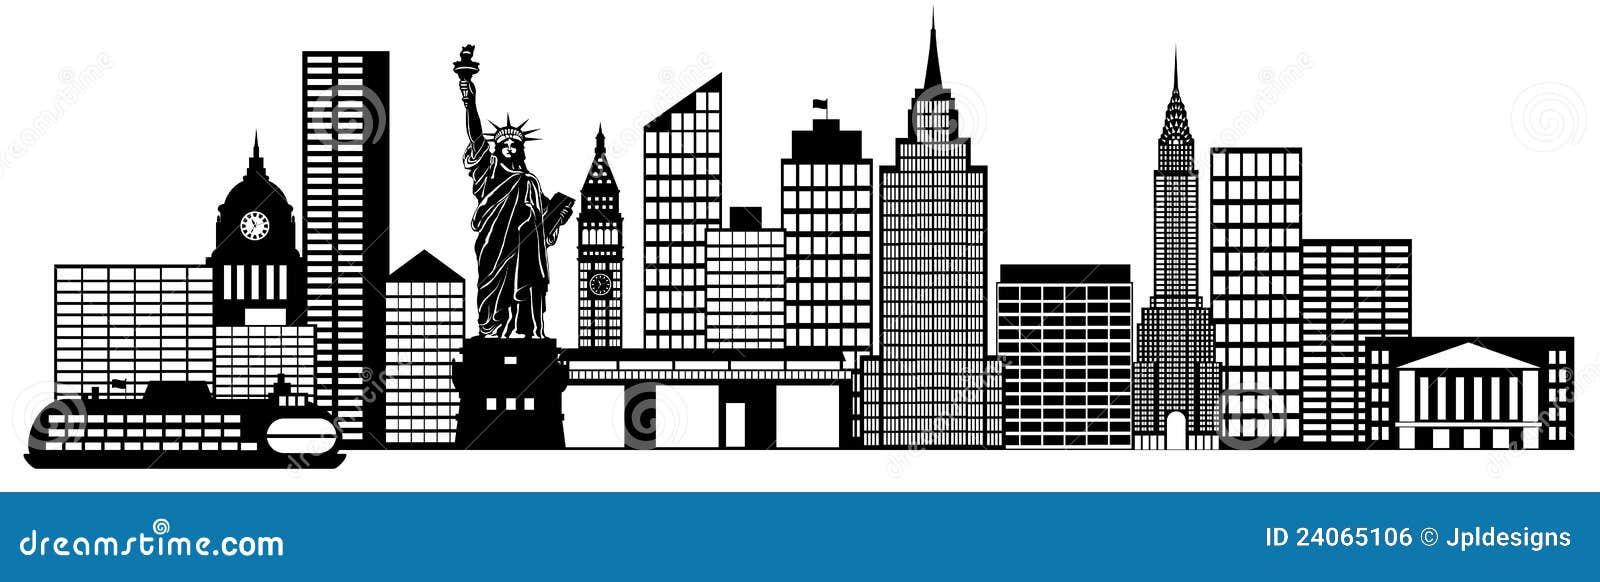 Clip Art New York City Clipart new york city skyline panorama clip art royalty free stock image art